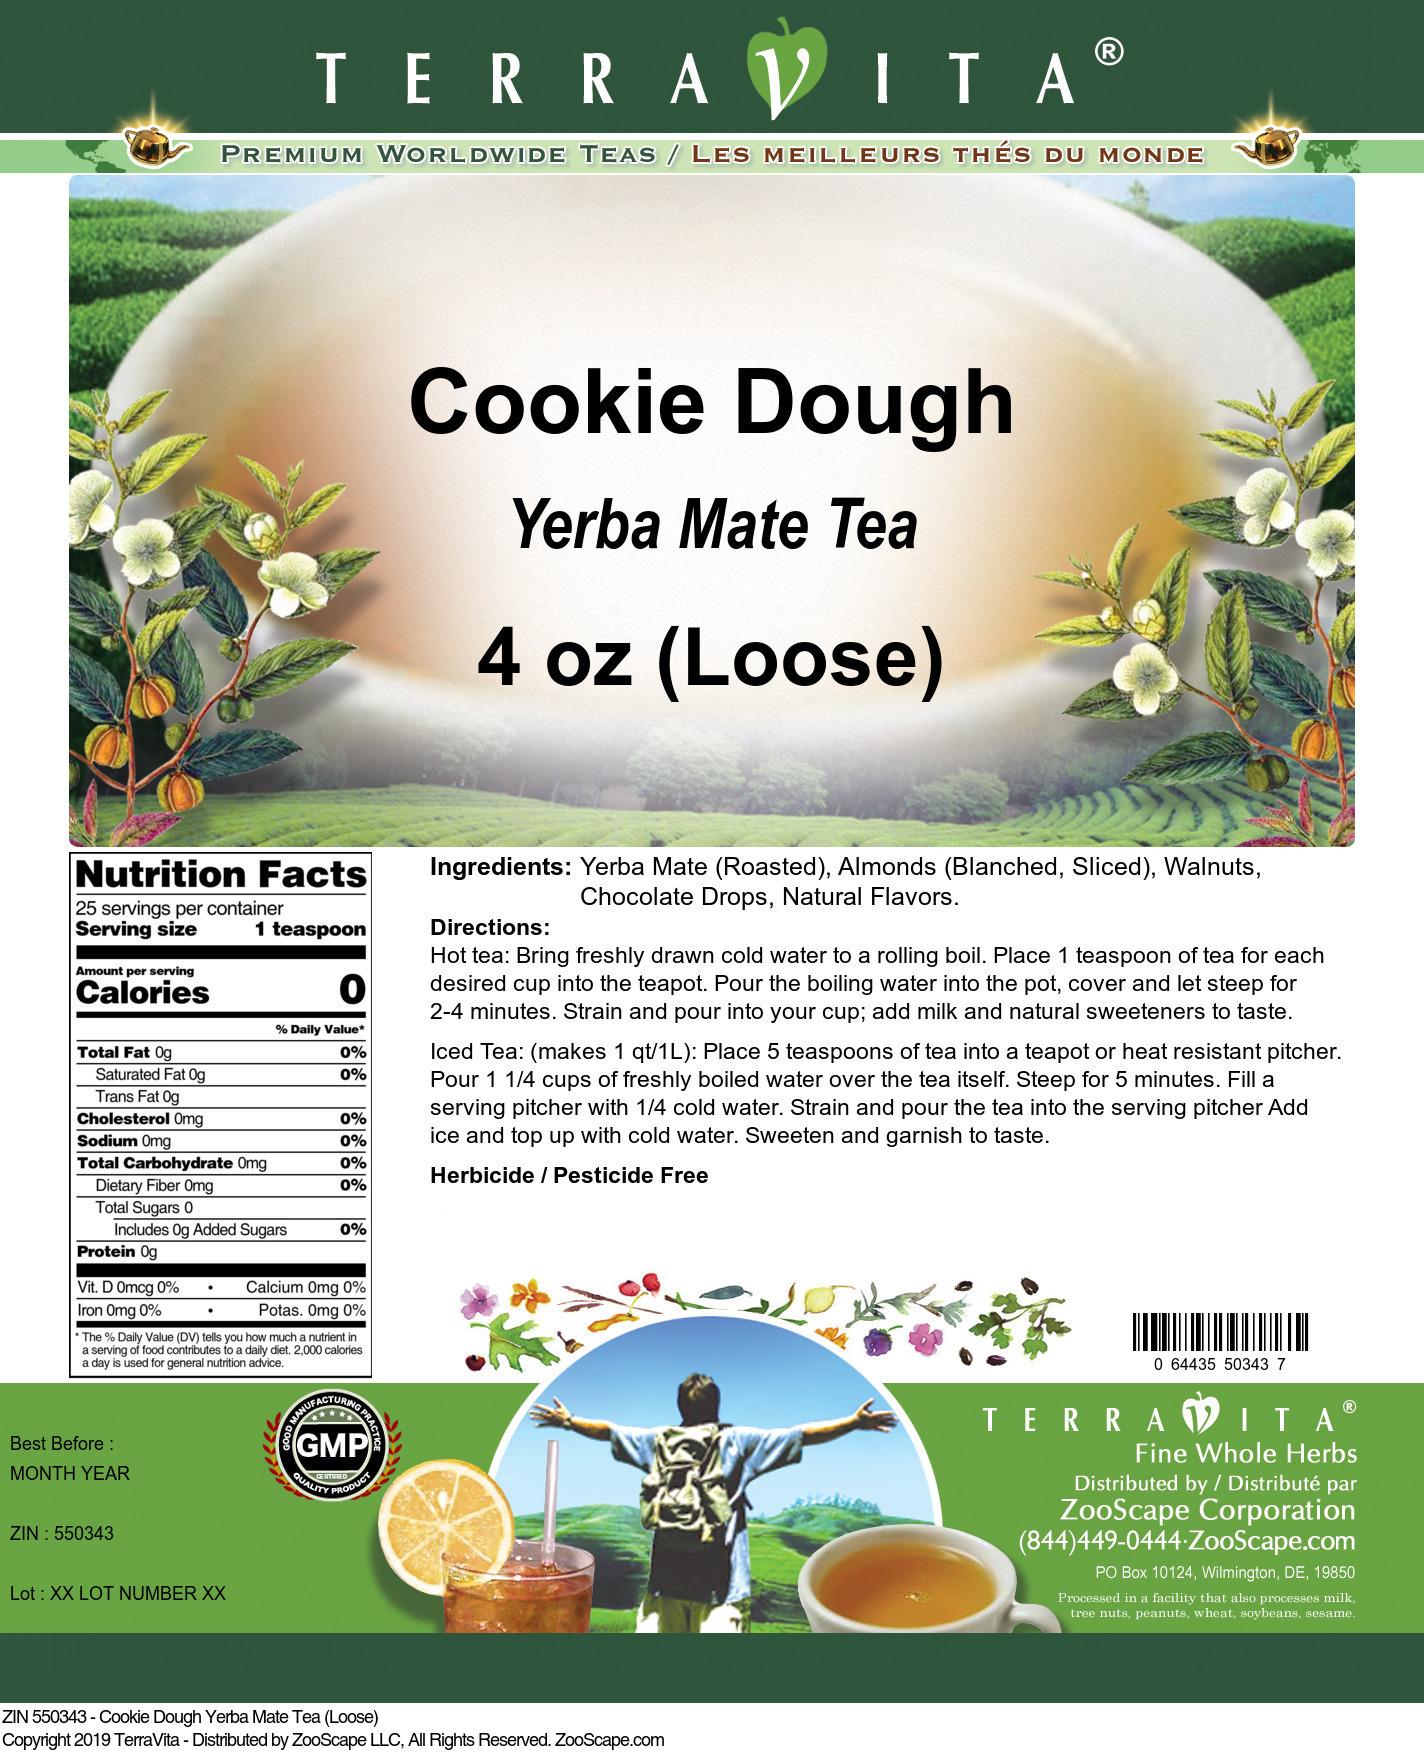 Cookie Dough Yerba Mate Tea (Loose)